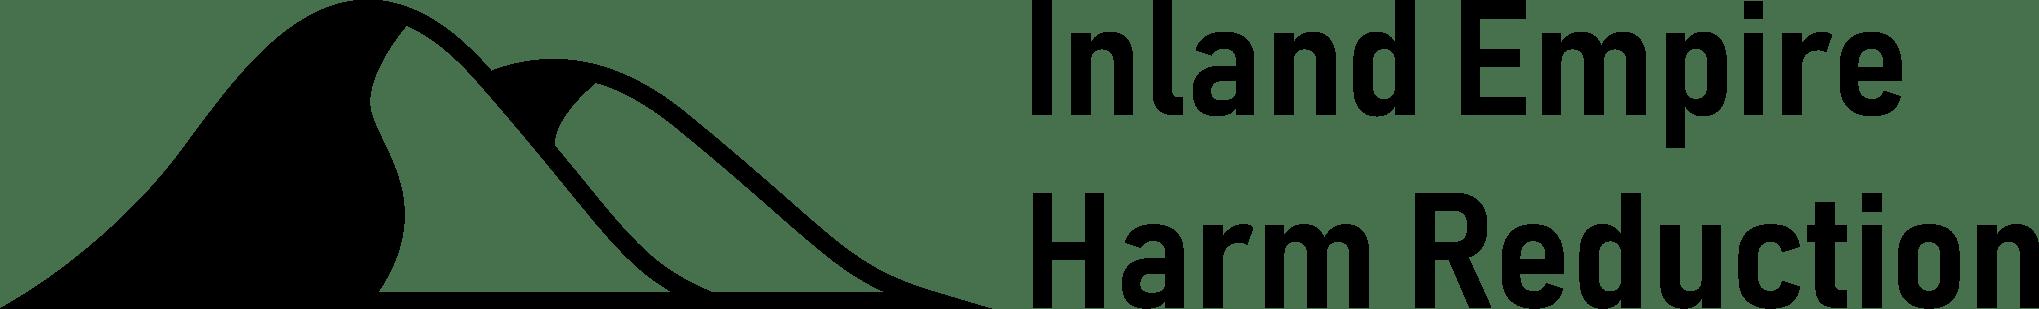 Inland Empire Harm Reduction